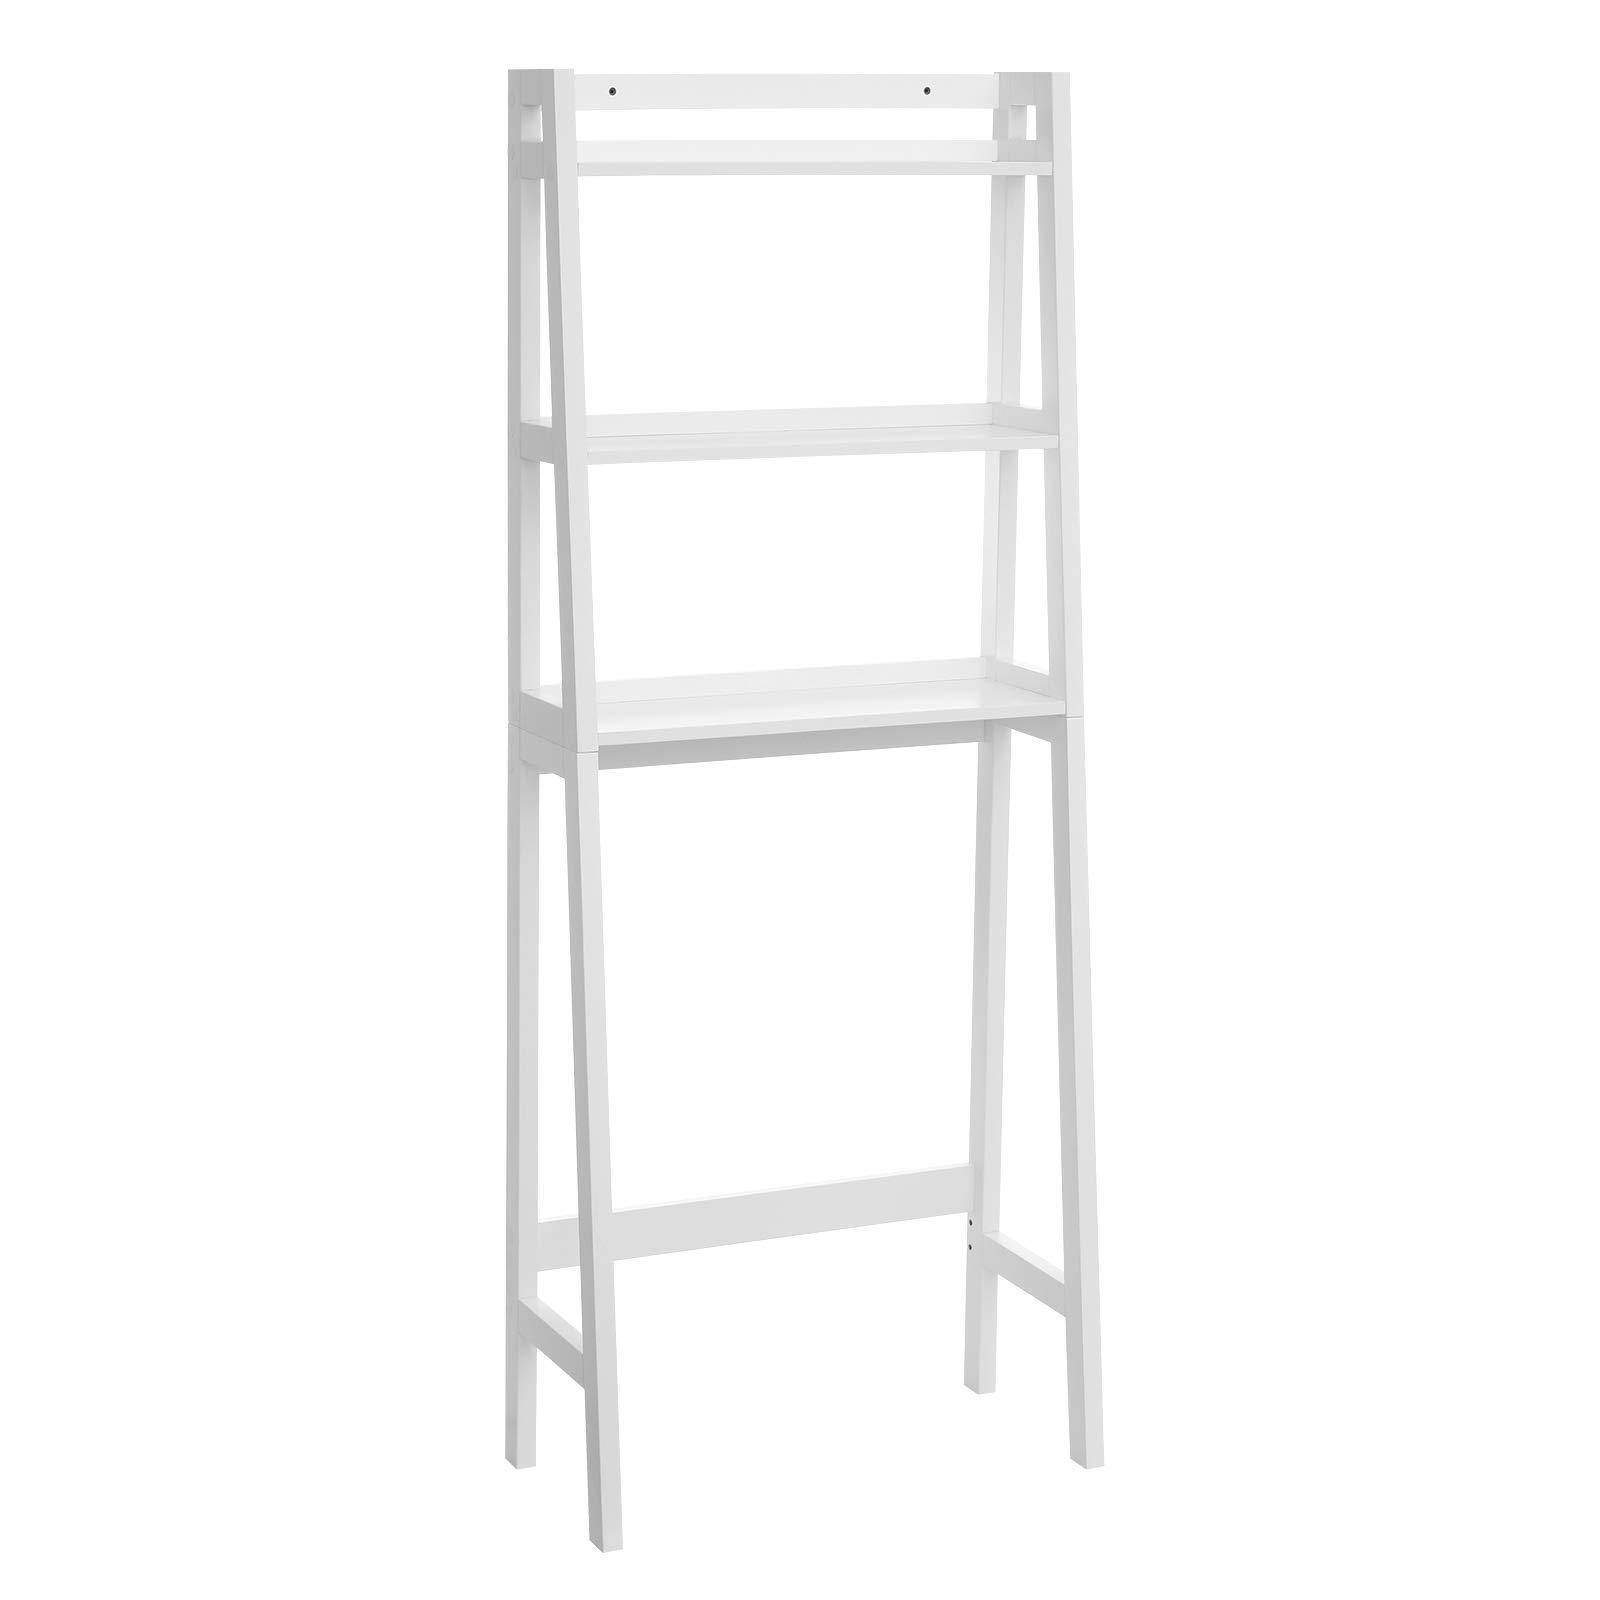 VASAGLE Over The Toilet Storage Rack, Bathroom Space Saver Unit, 3-Tier Shelf Organizer, Adjustable Bottom Bar, White UBBC11WT by VASAGLE